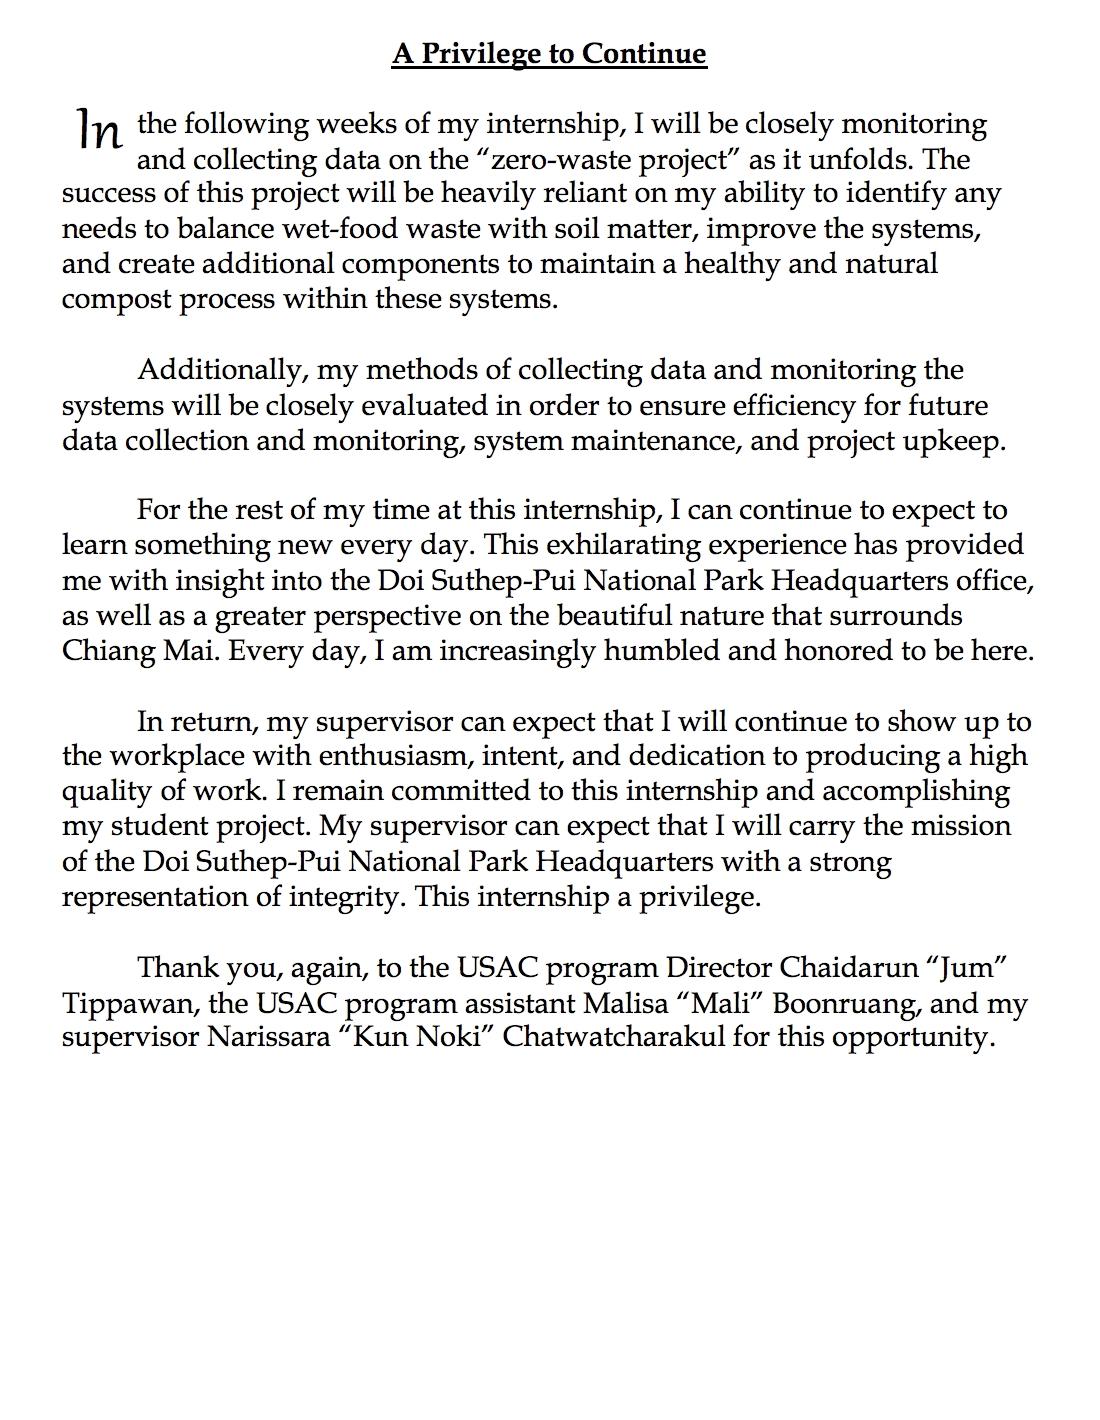 Mid-Term Intern Essay pg5.jpg